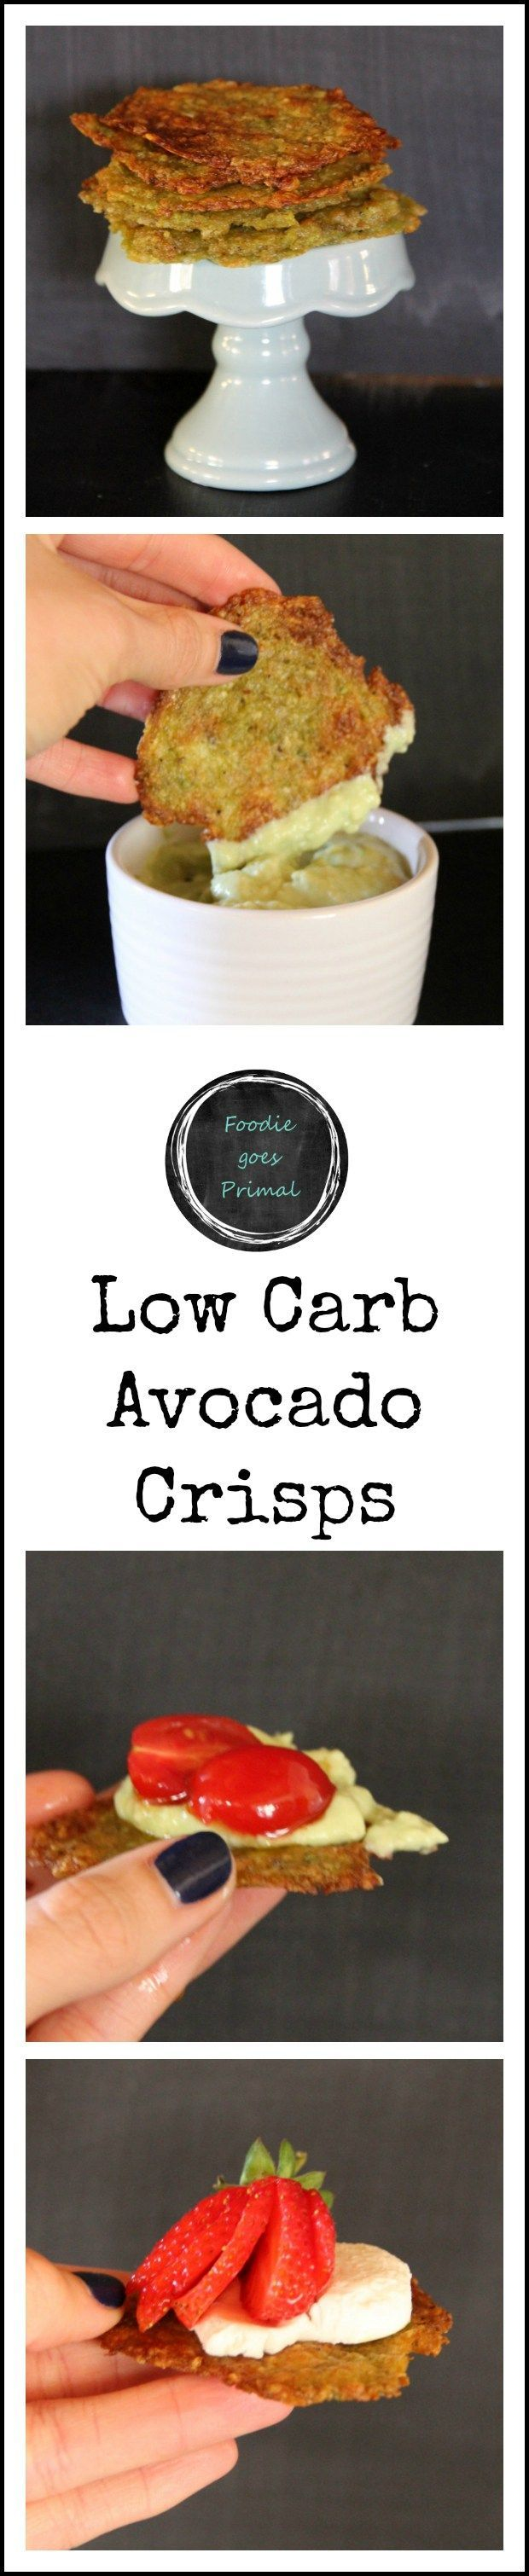 Low Carb Avocado Crisps - Ingr Challenge Pinterest